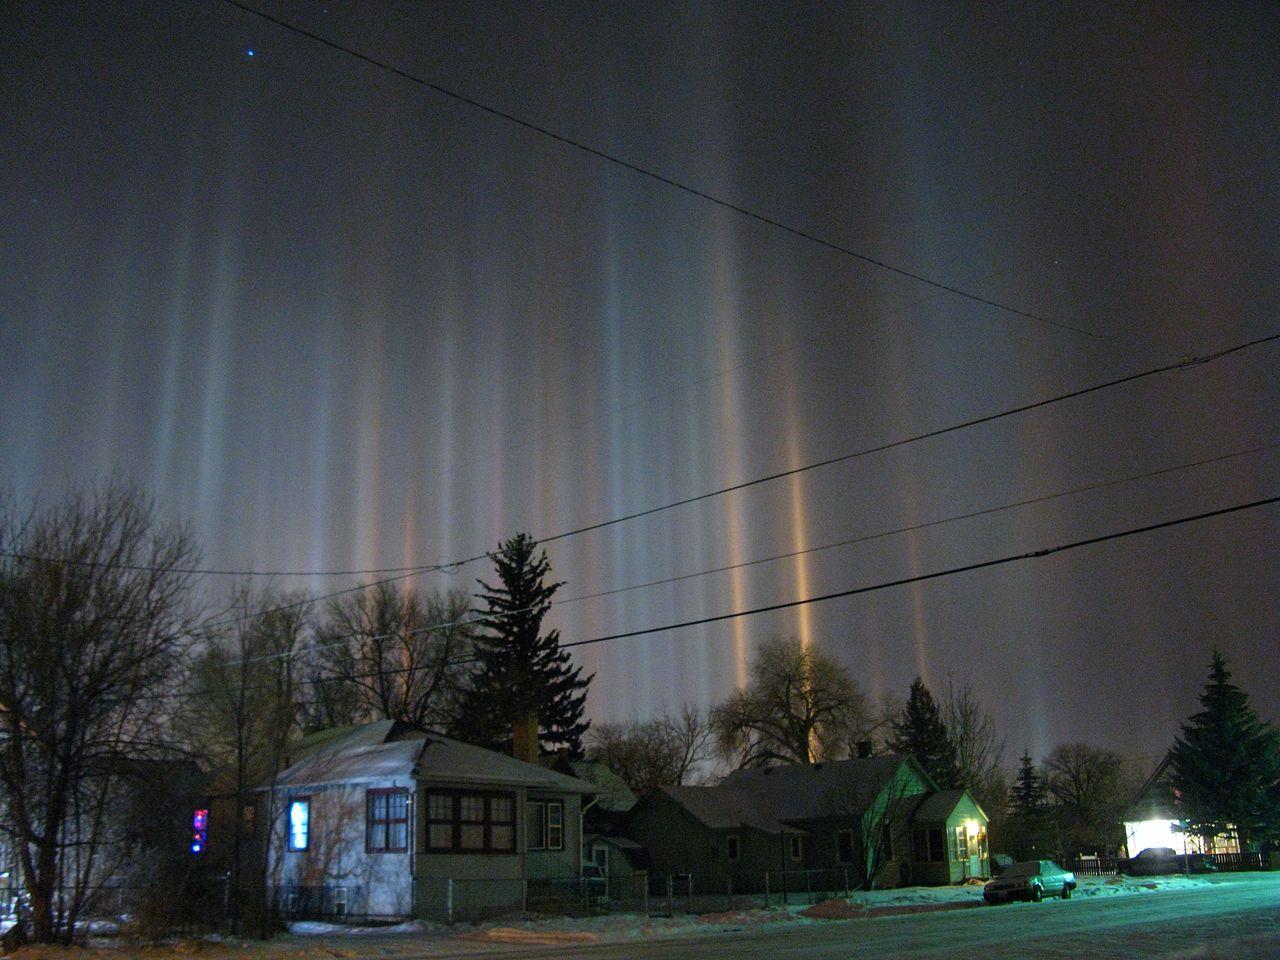 Night light wikipedia - Light Pillars Over Laramie Wyoming In Winter Night Light Pillar Wikipedia